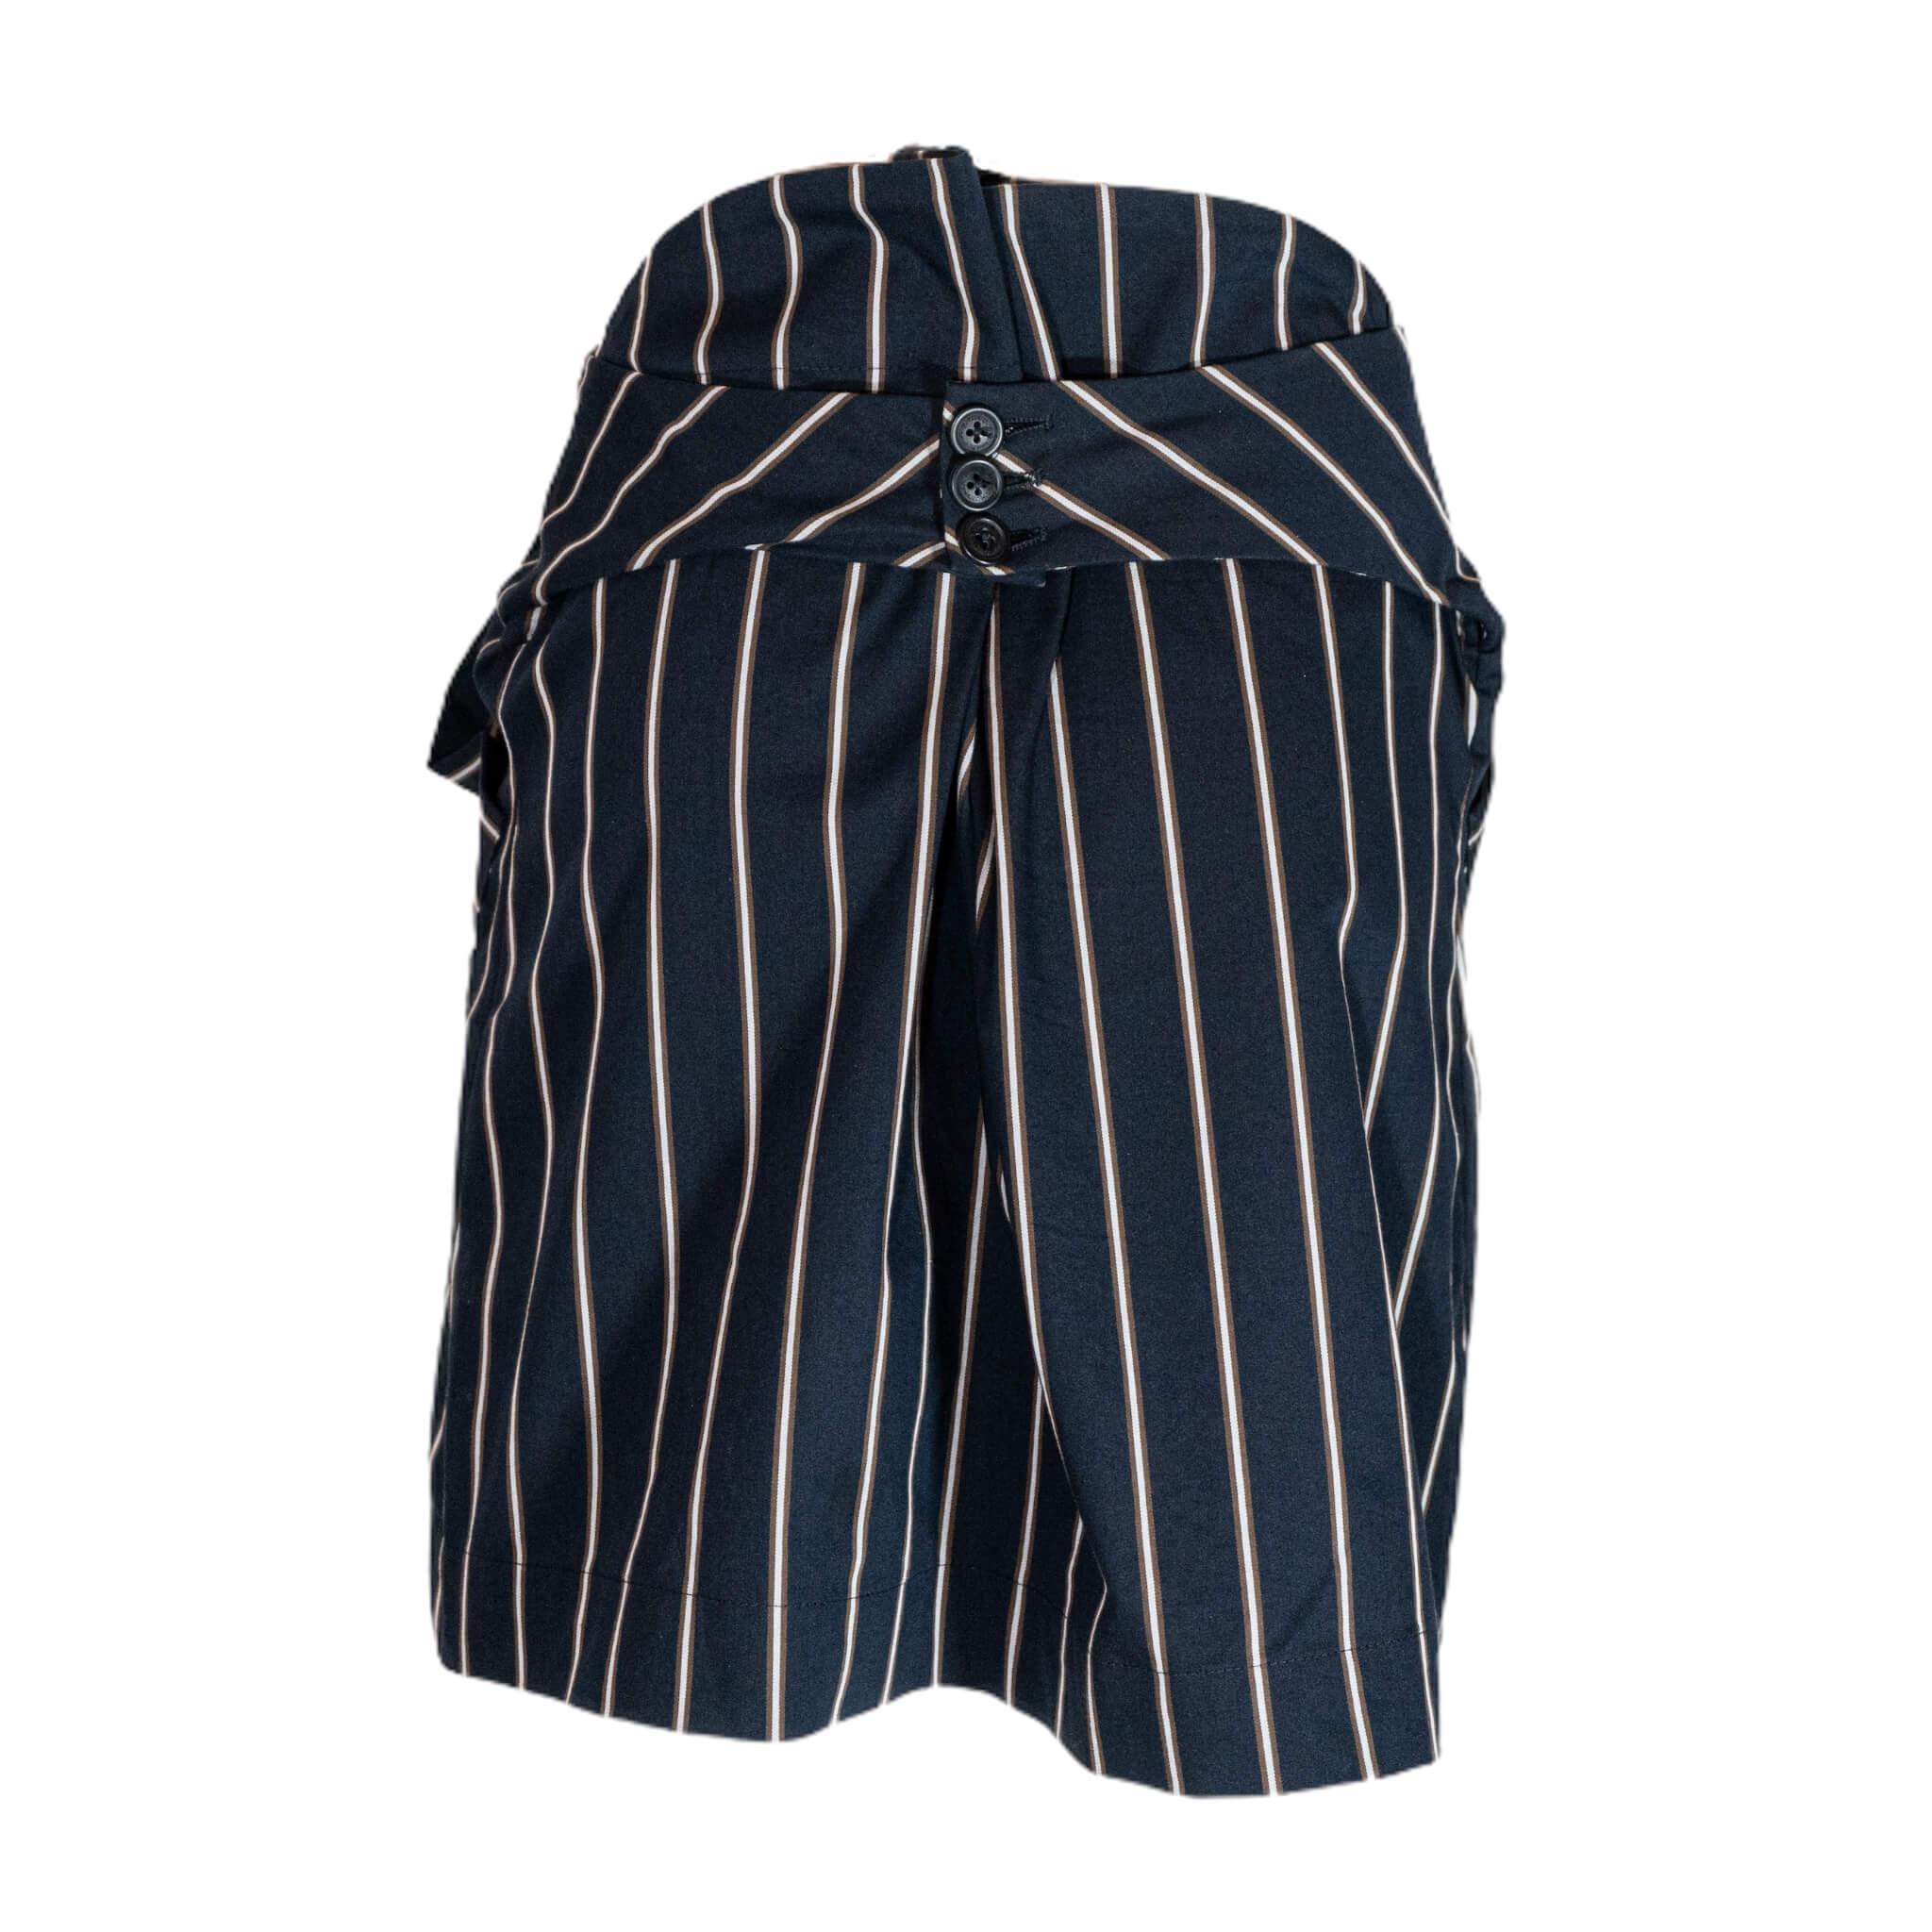 Vivienne Westwood Cutout Strip Skirt